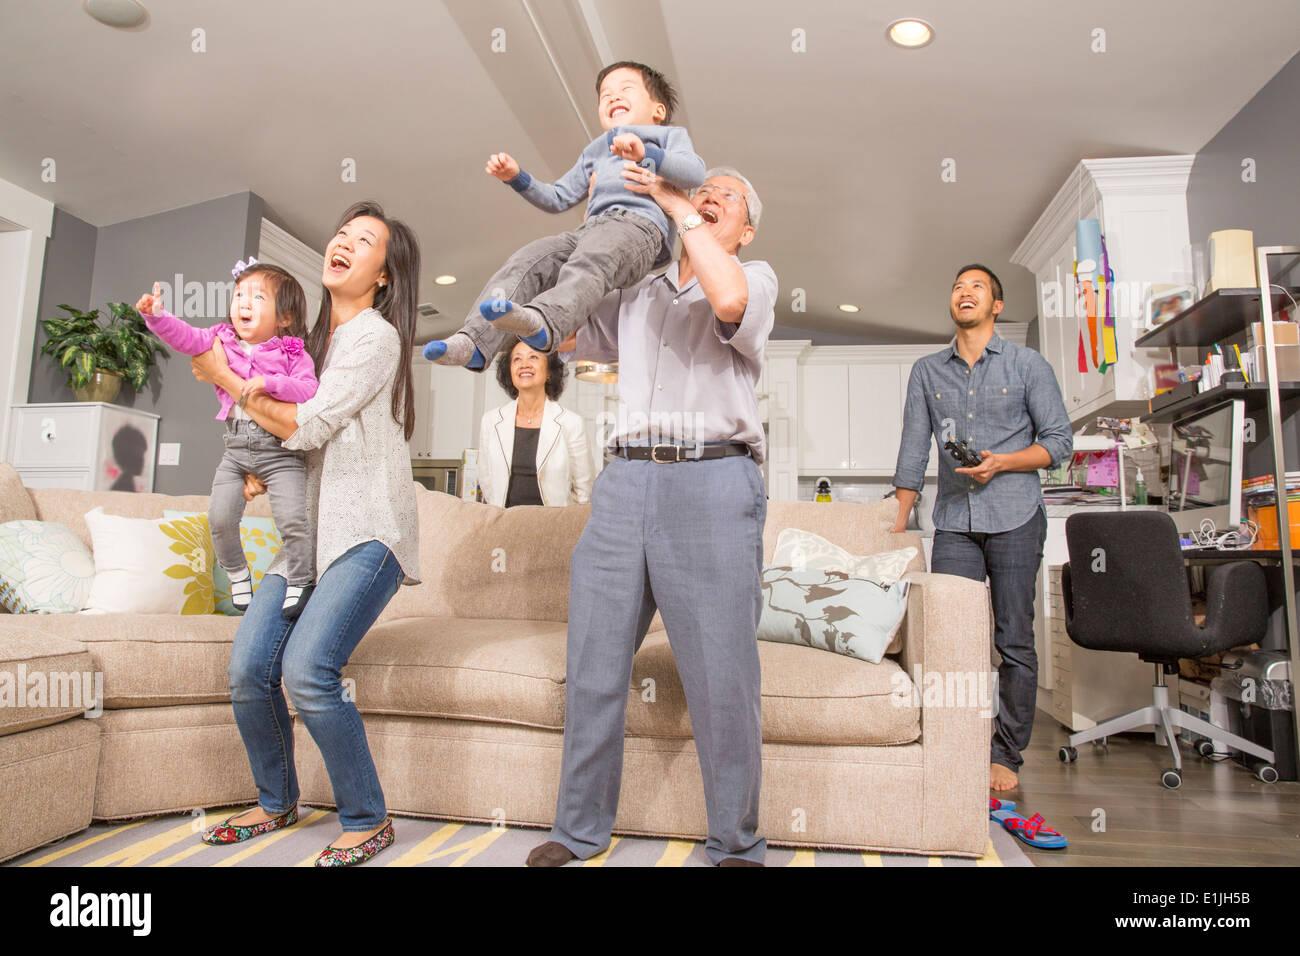 Three generation family having fun in sitting room - Stock Image